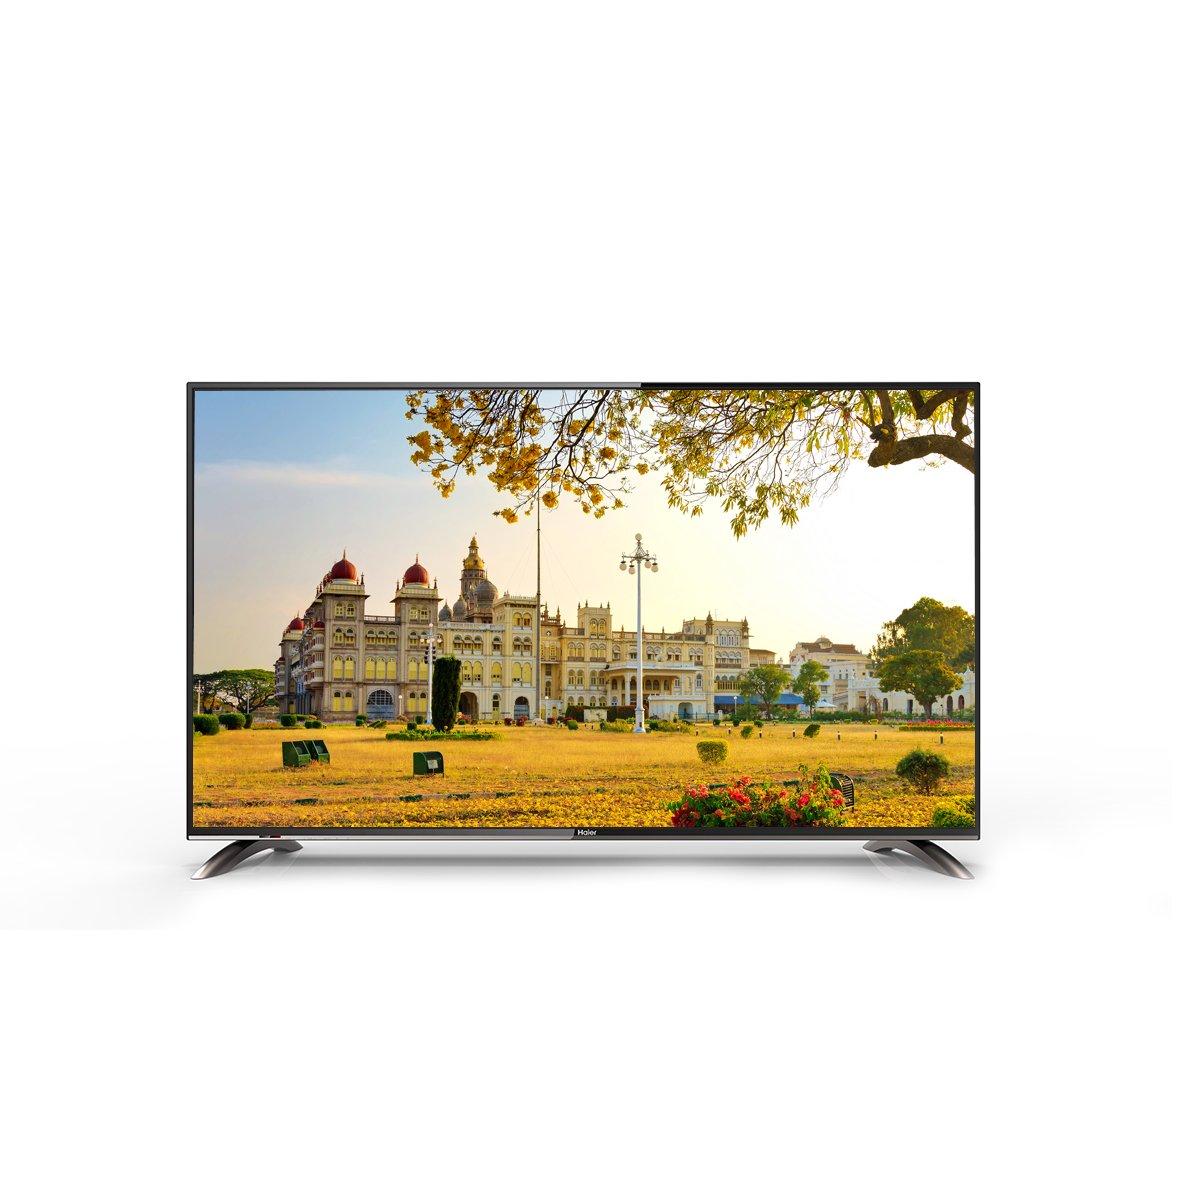 Haier LE50B9000M 50 Inch Full HD LED TV